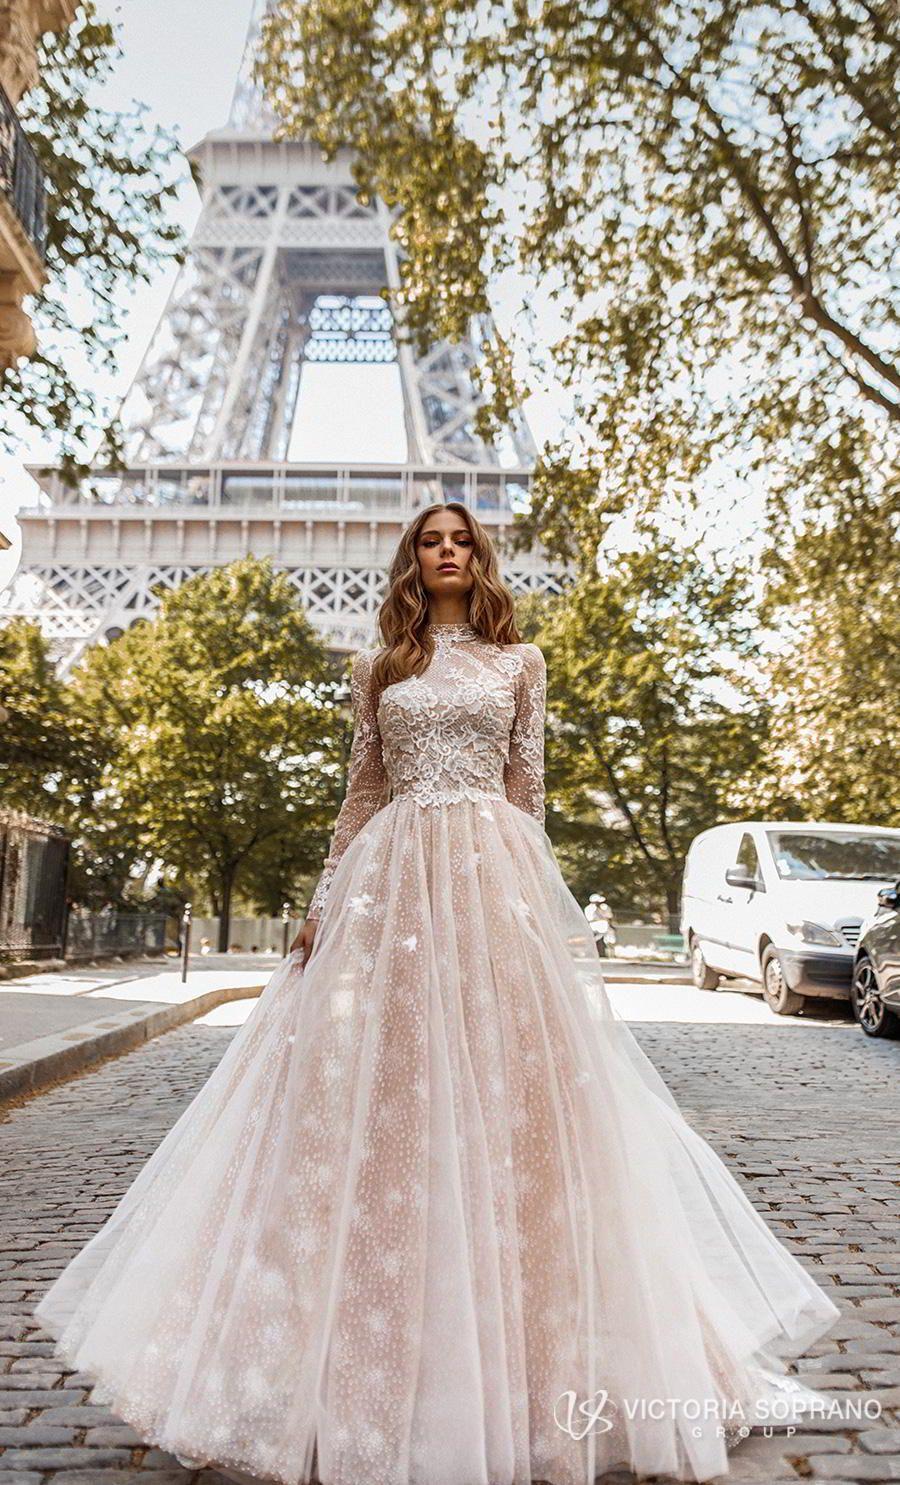 High neck wedding dresses  These Victoria Soprano Wedding Dresses Will Make You Swoon u